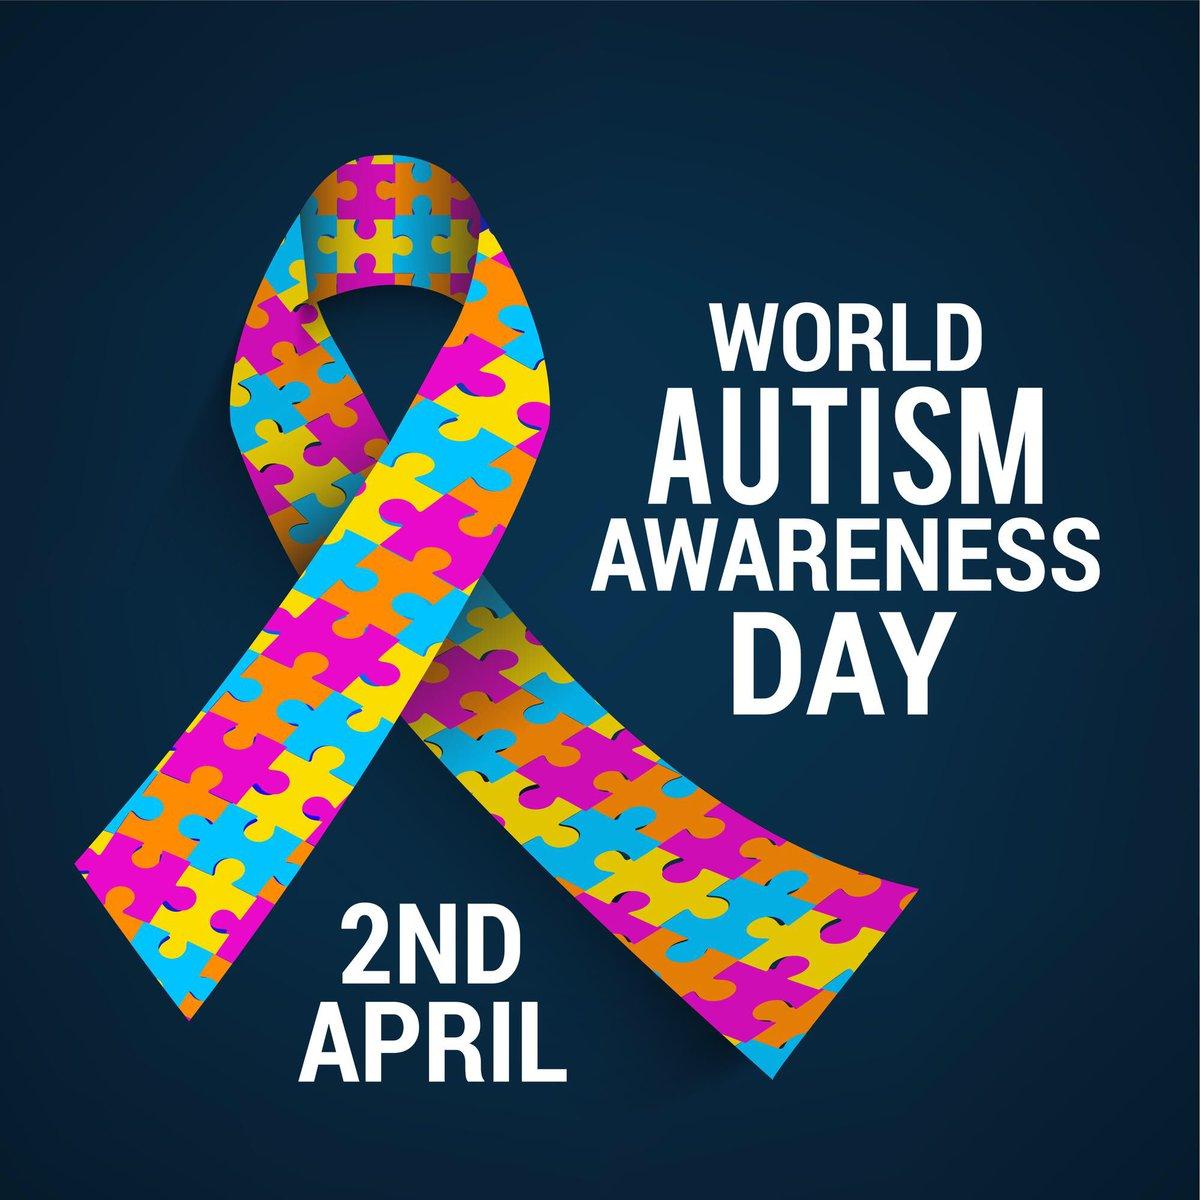 Happy World Autism Awareness Day everyone!  #celebratediversity #WorldAutismDay2020 <br>http://pic.twitter.com/l5pC3nMay3